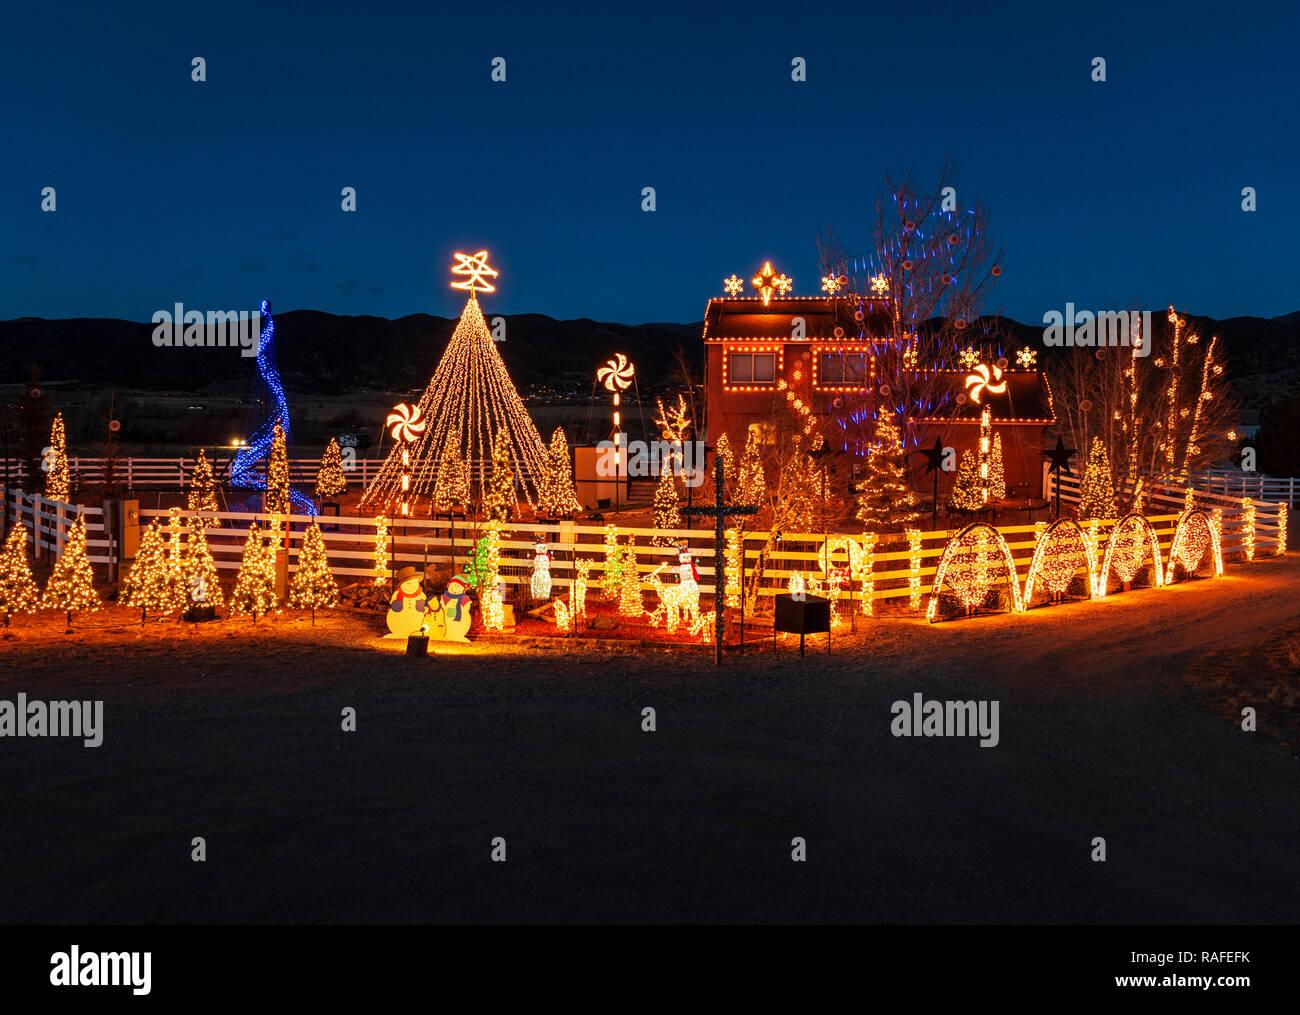 Dusk view of over 140,000 Christmas holiday lights adorn the Gross home; Salida; Colorado